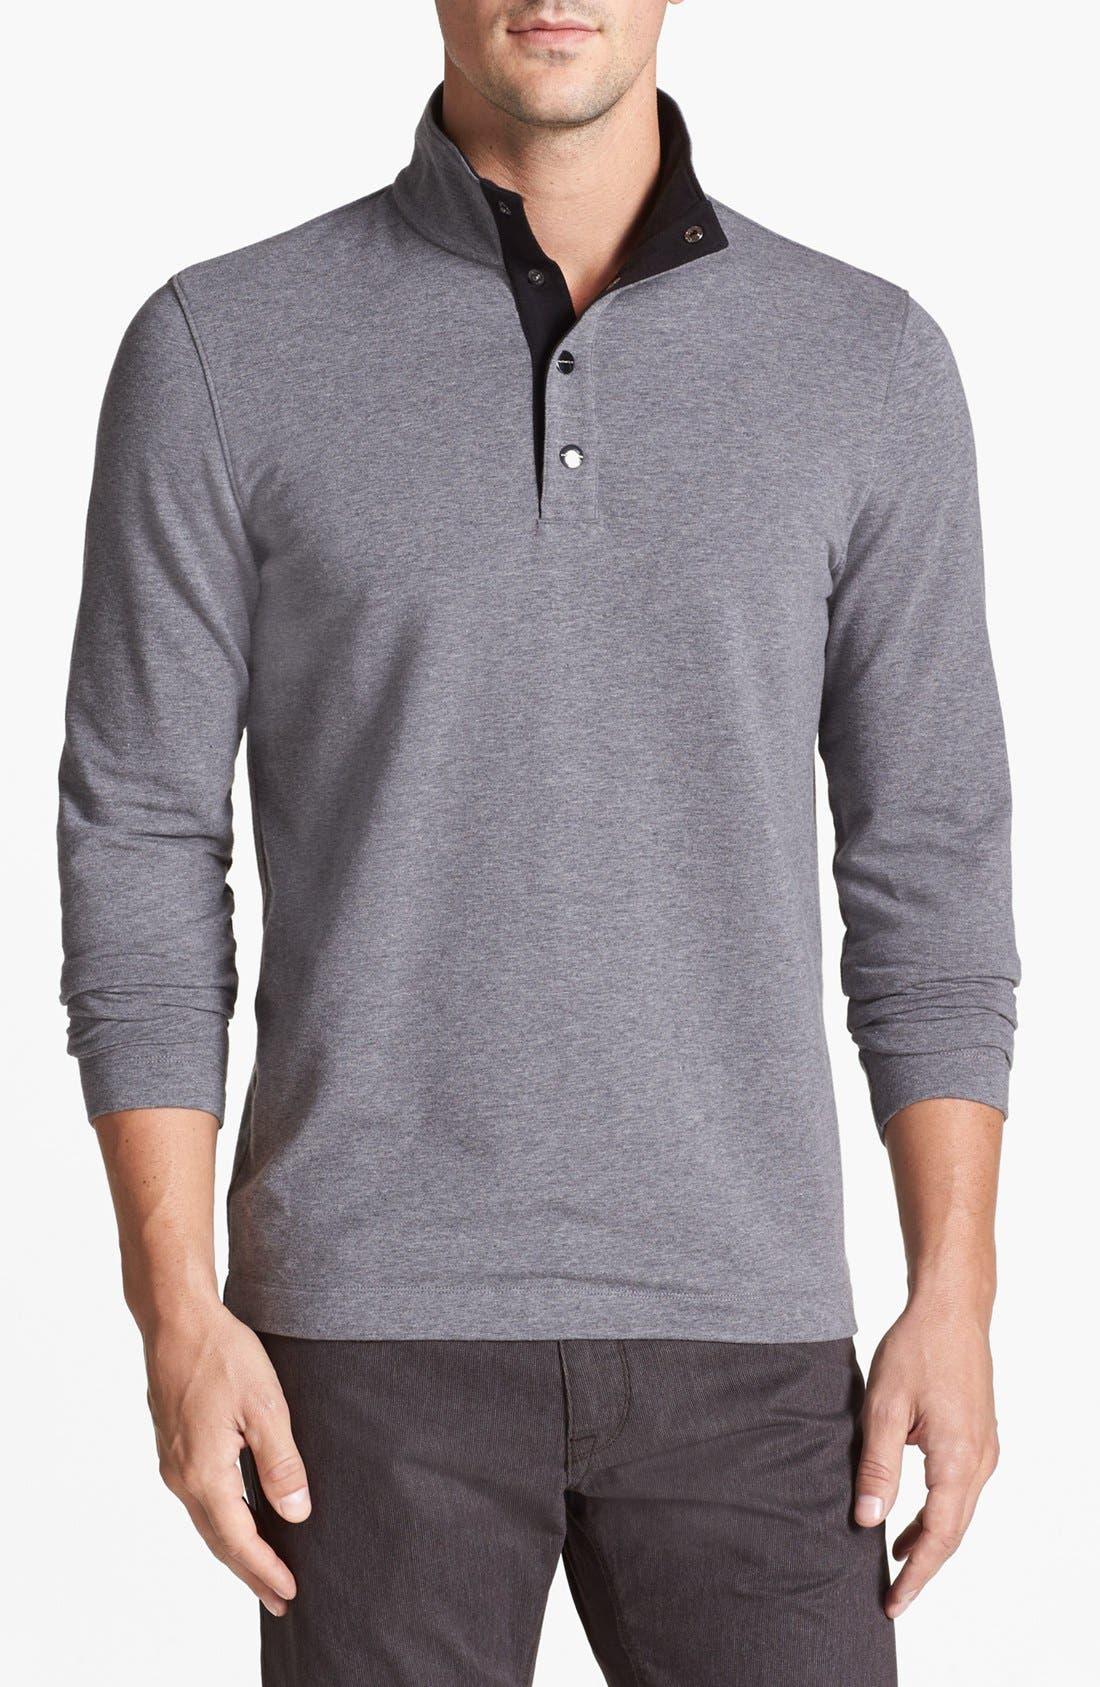 Main Image - Michael Kors Fleece Long Sleeve Top